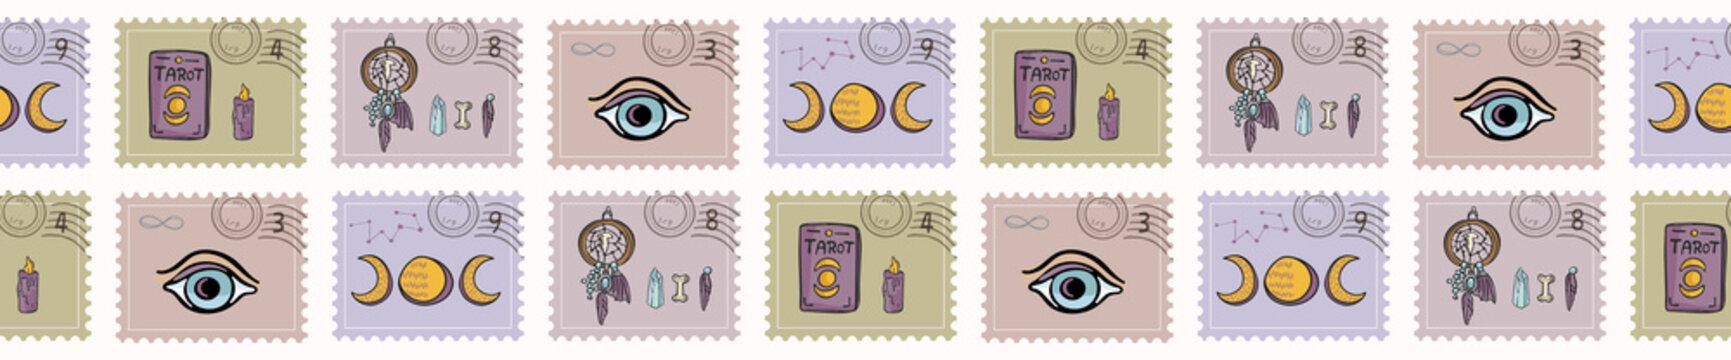 Esoteric Magic Postage Stamps. Hand Drawn Seamless Vector Border. Spiritual Symbols Postal Stationery. Tarot, Crystal, Dreamcatcher. Meditation Journal Mail Art Banner Ribbon, Boho New Age Planners